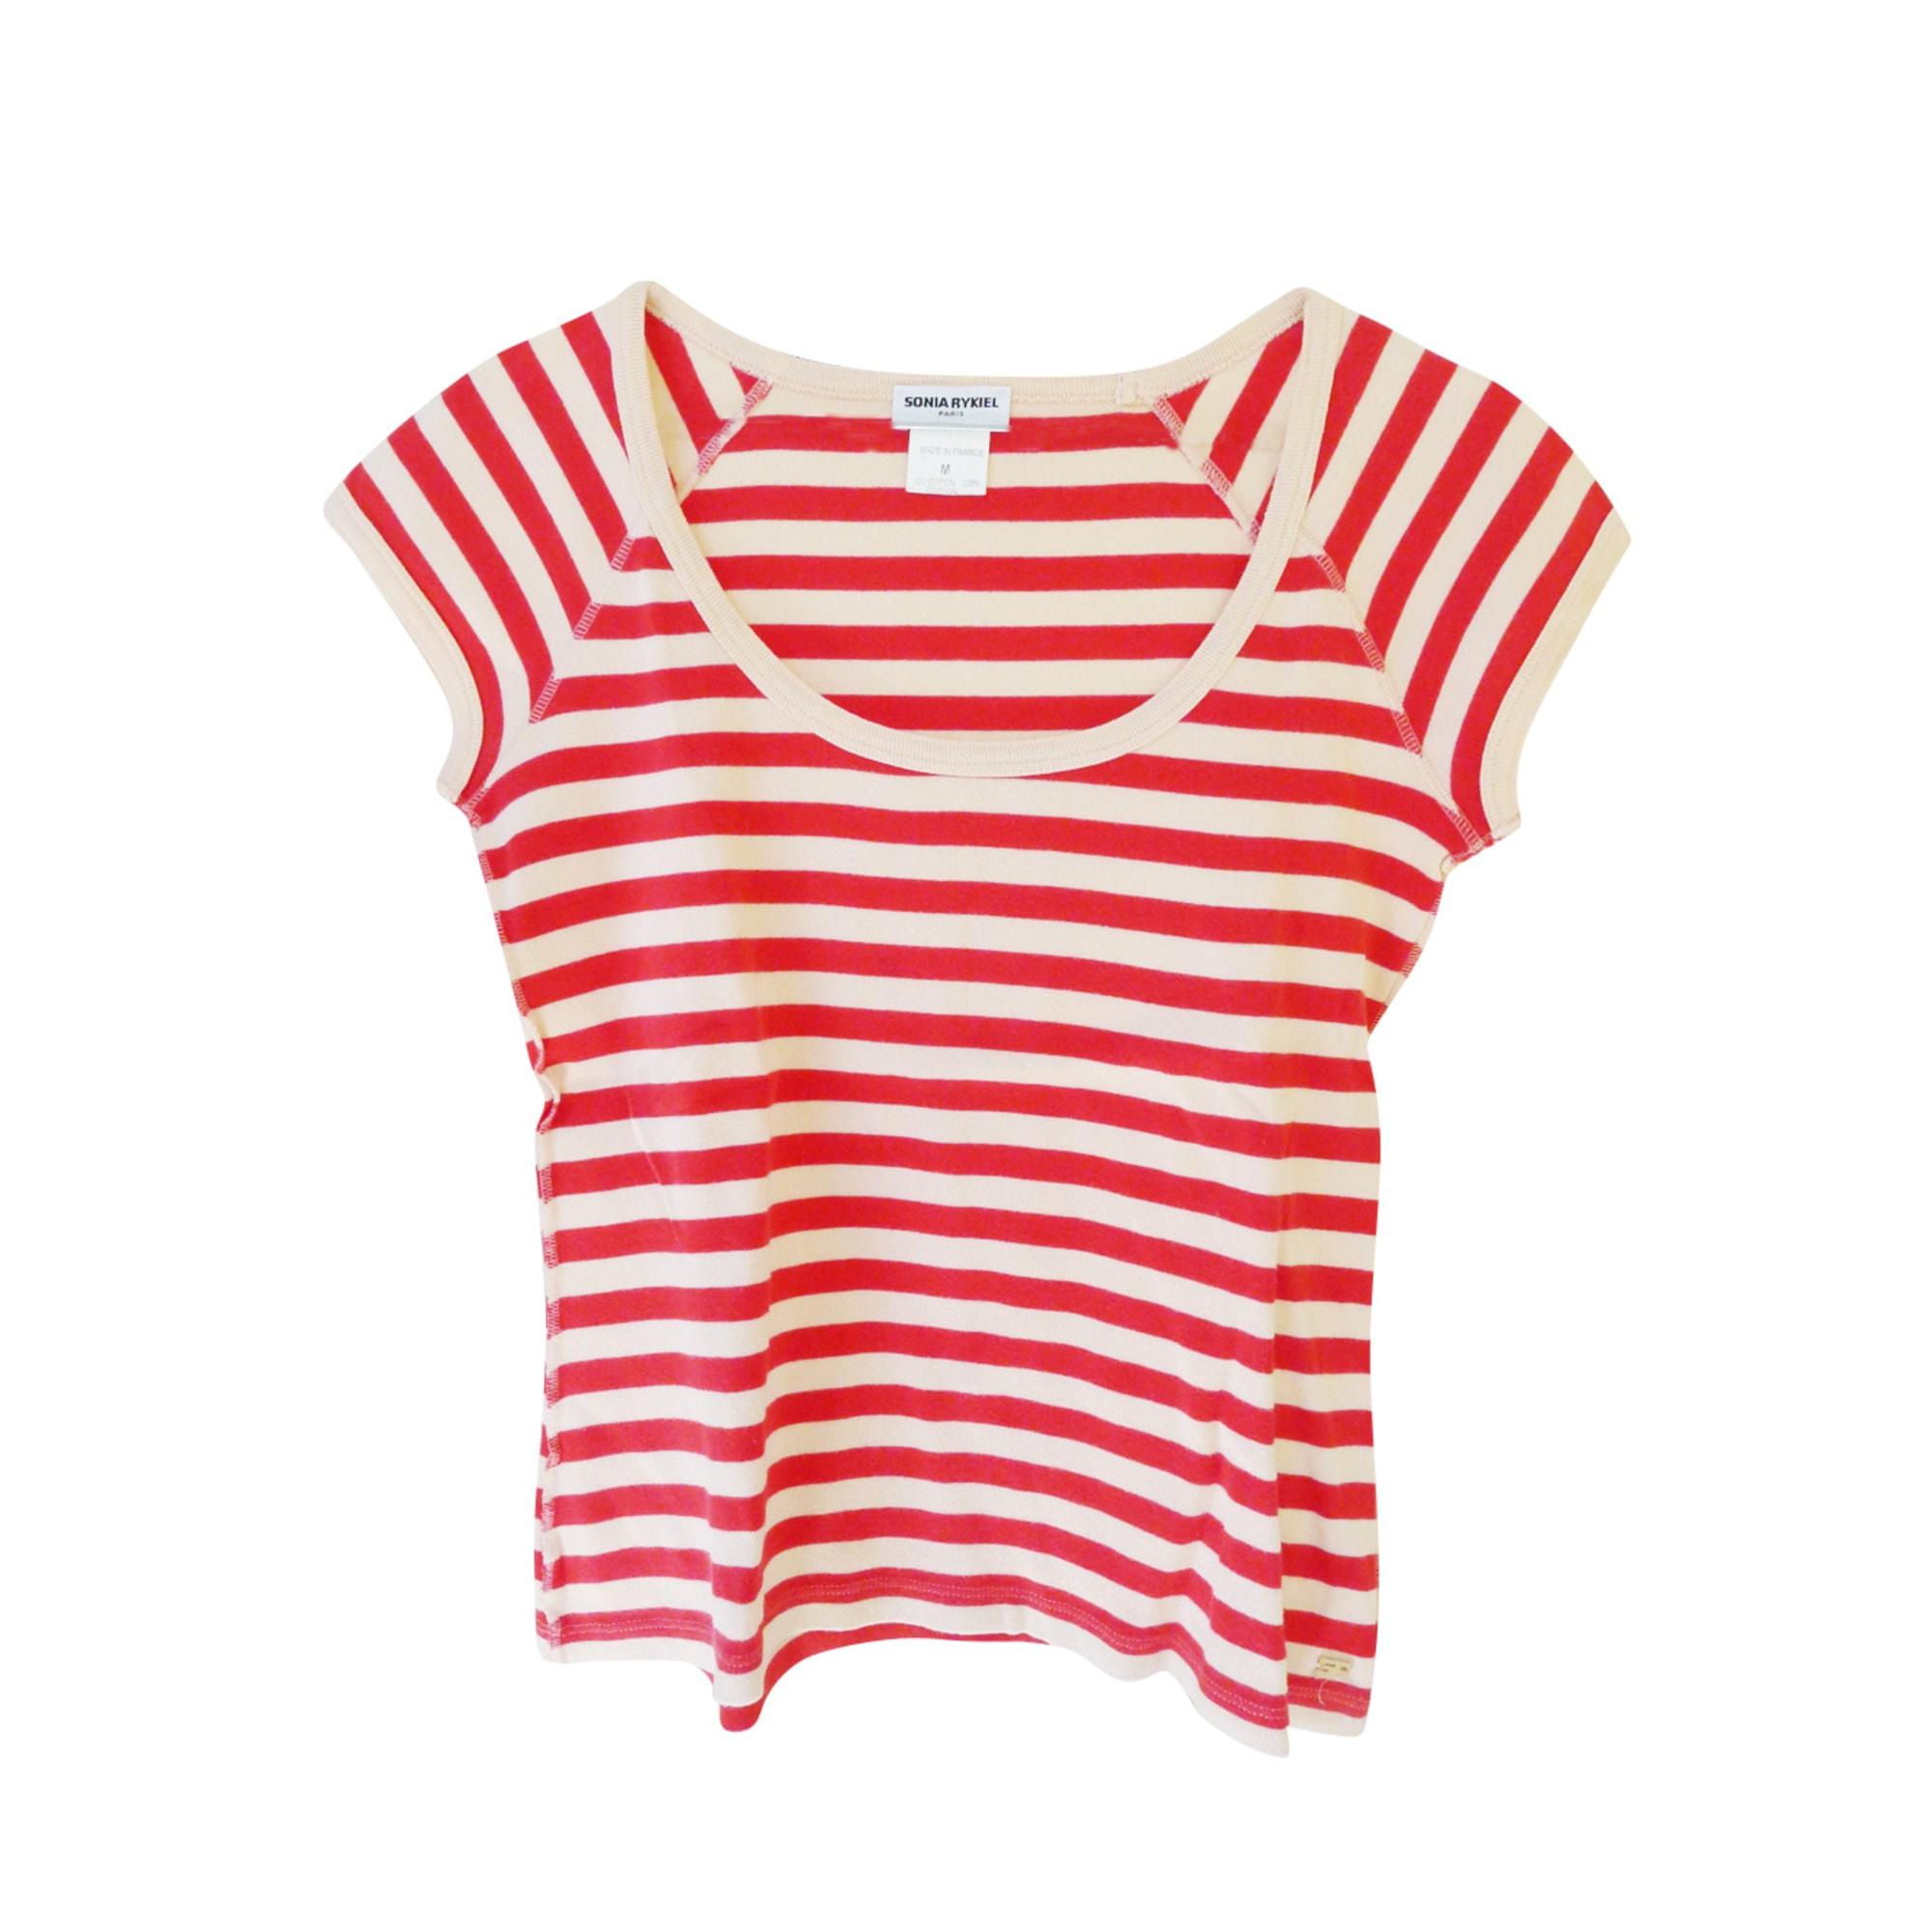 Top, tee-shirt SONIA RYKIEL Rouge, bordeaux